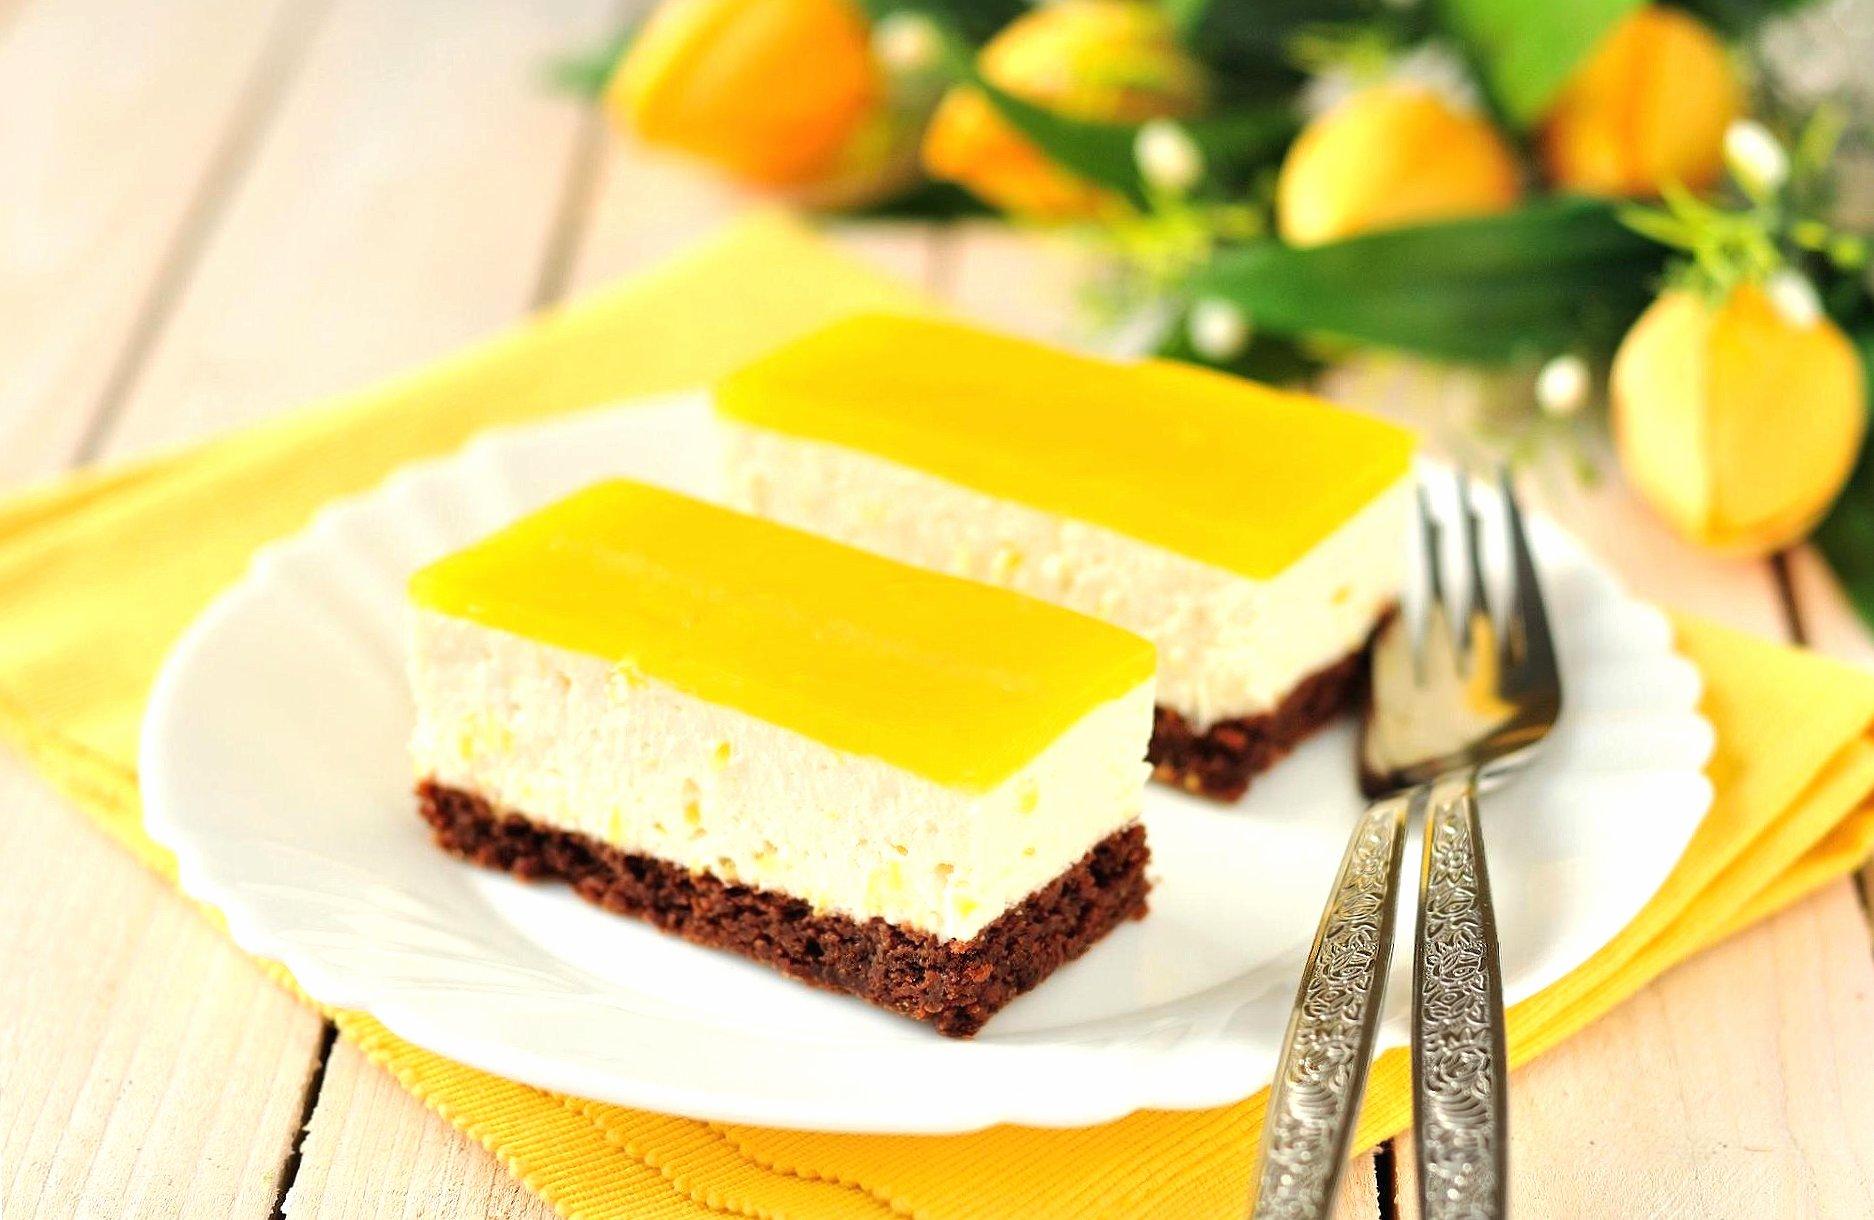 Lemon dessert wallpapers HD quality